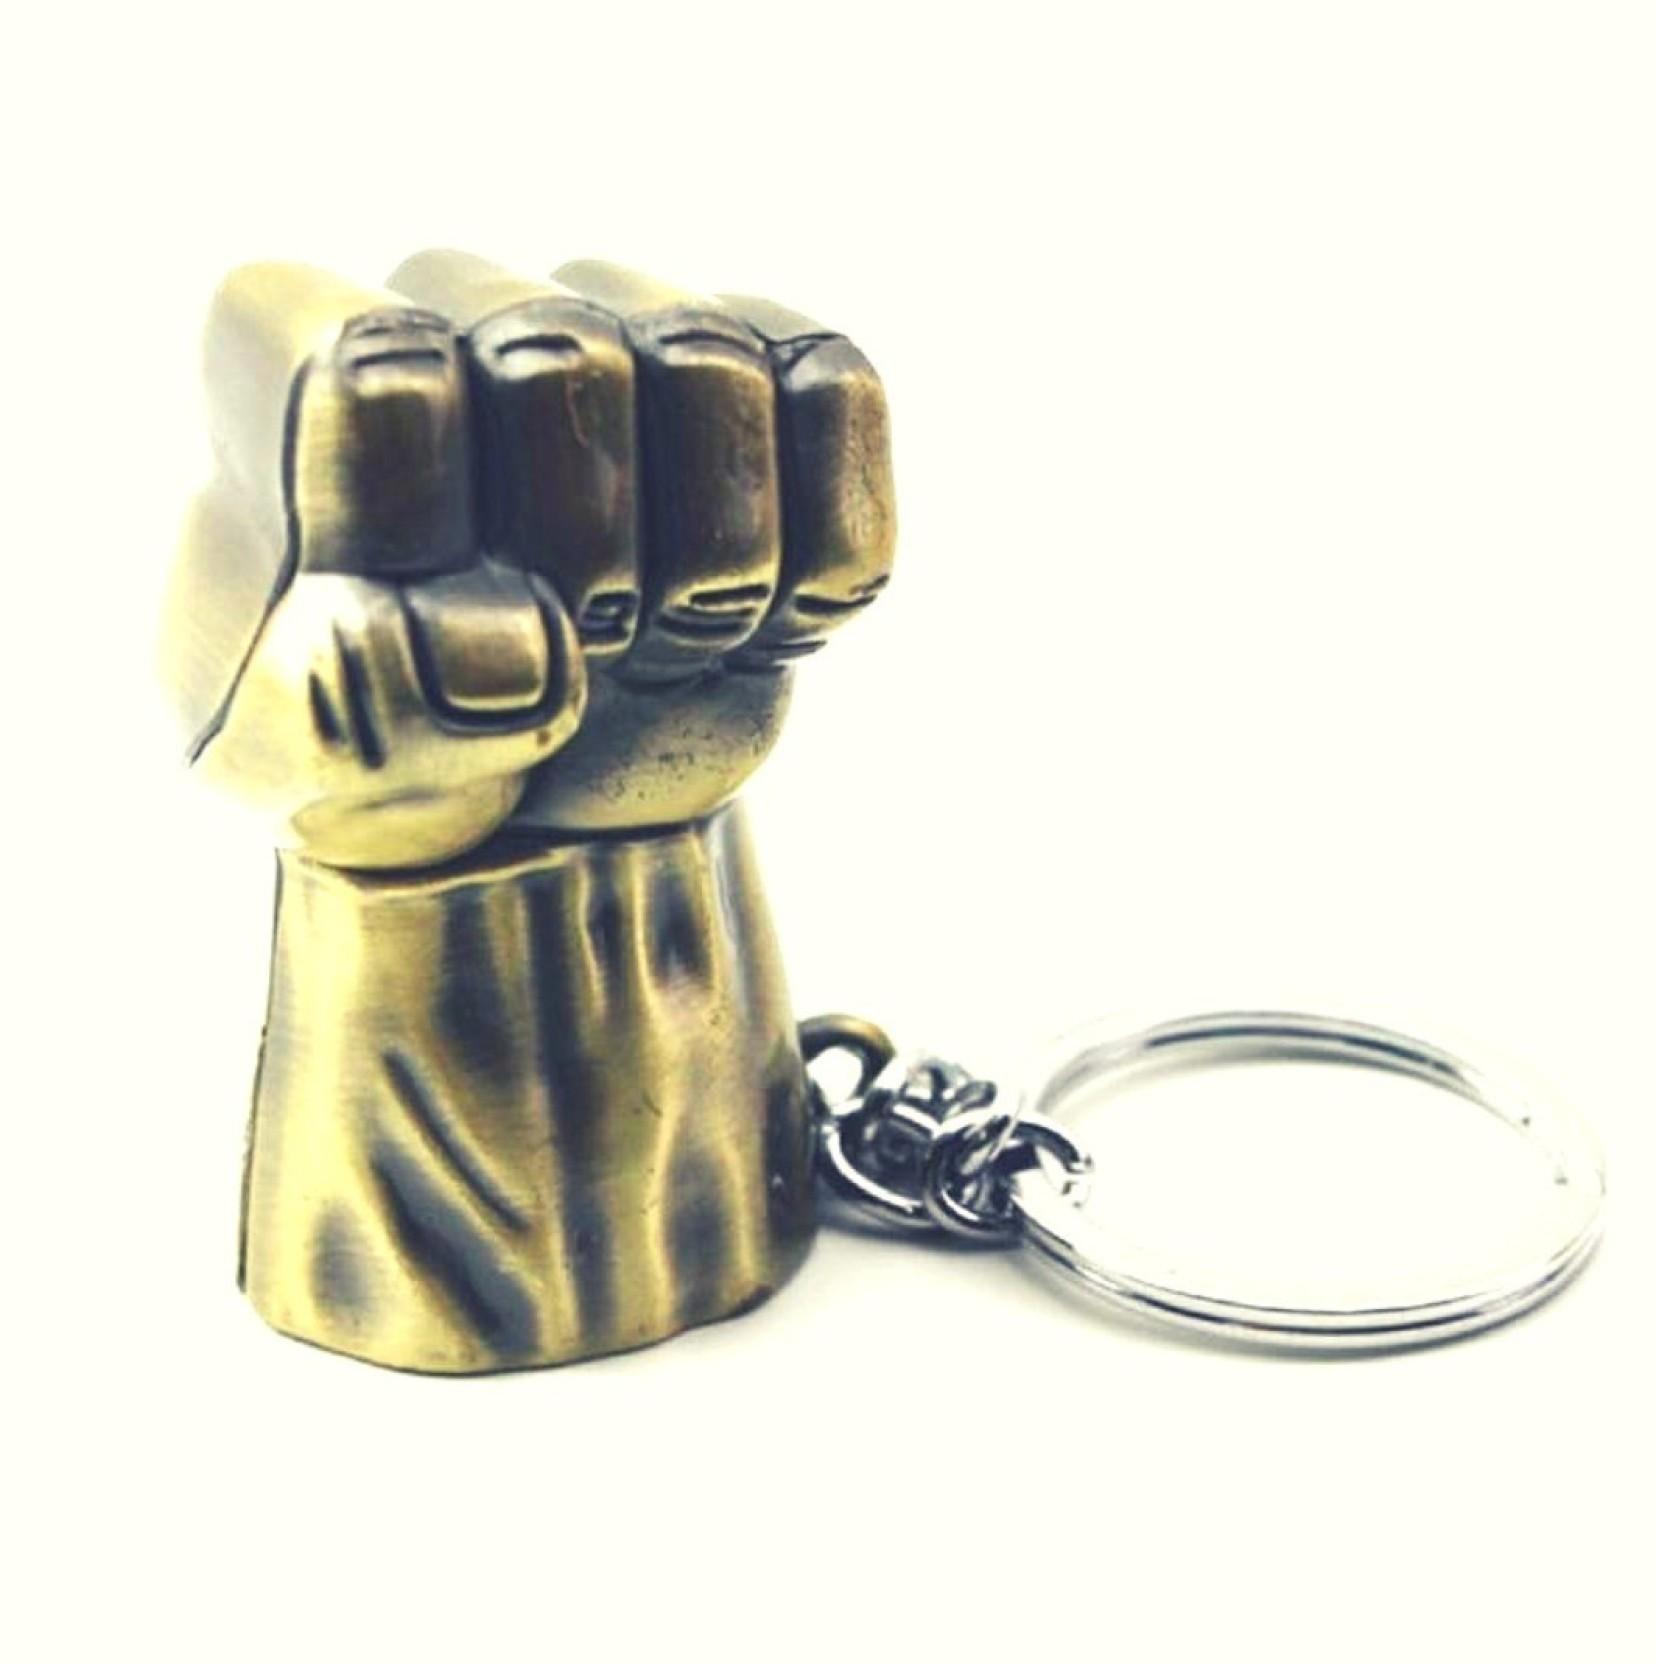 Jakha Thor Avengers  Infinity War Star Hulk Fist Metal Golden Locking Key  Chain Keyring for Men Women Boys Girls Car  ba11c0013